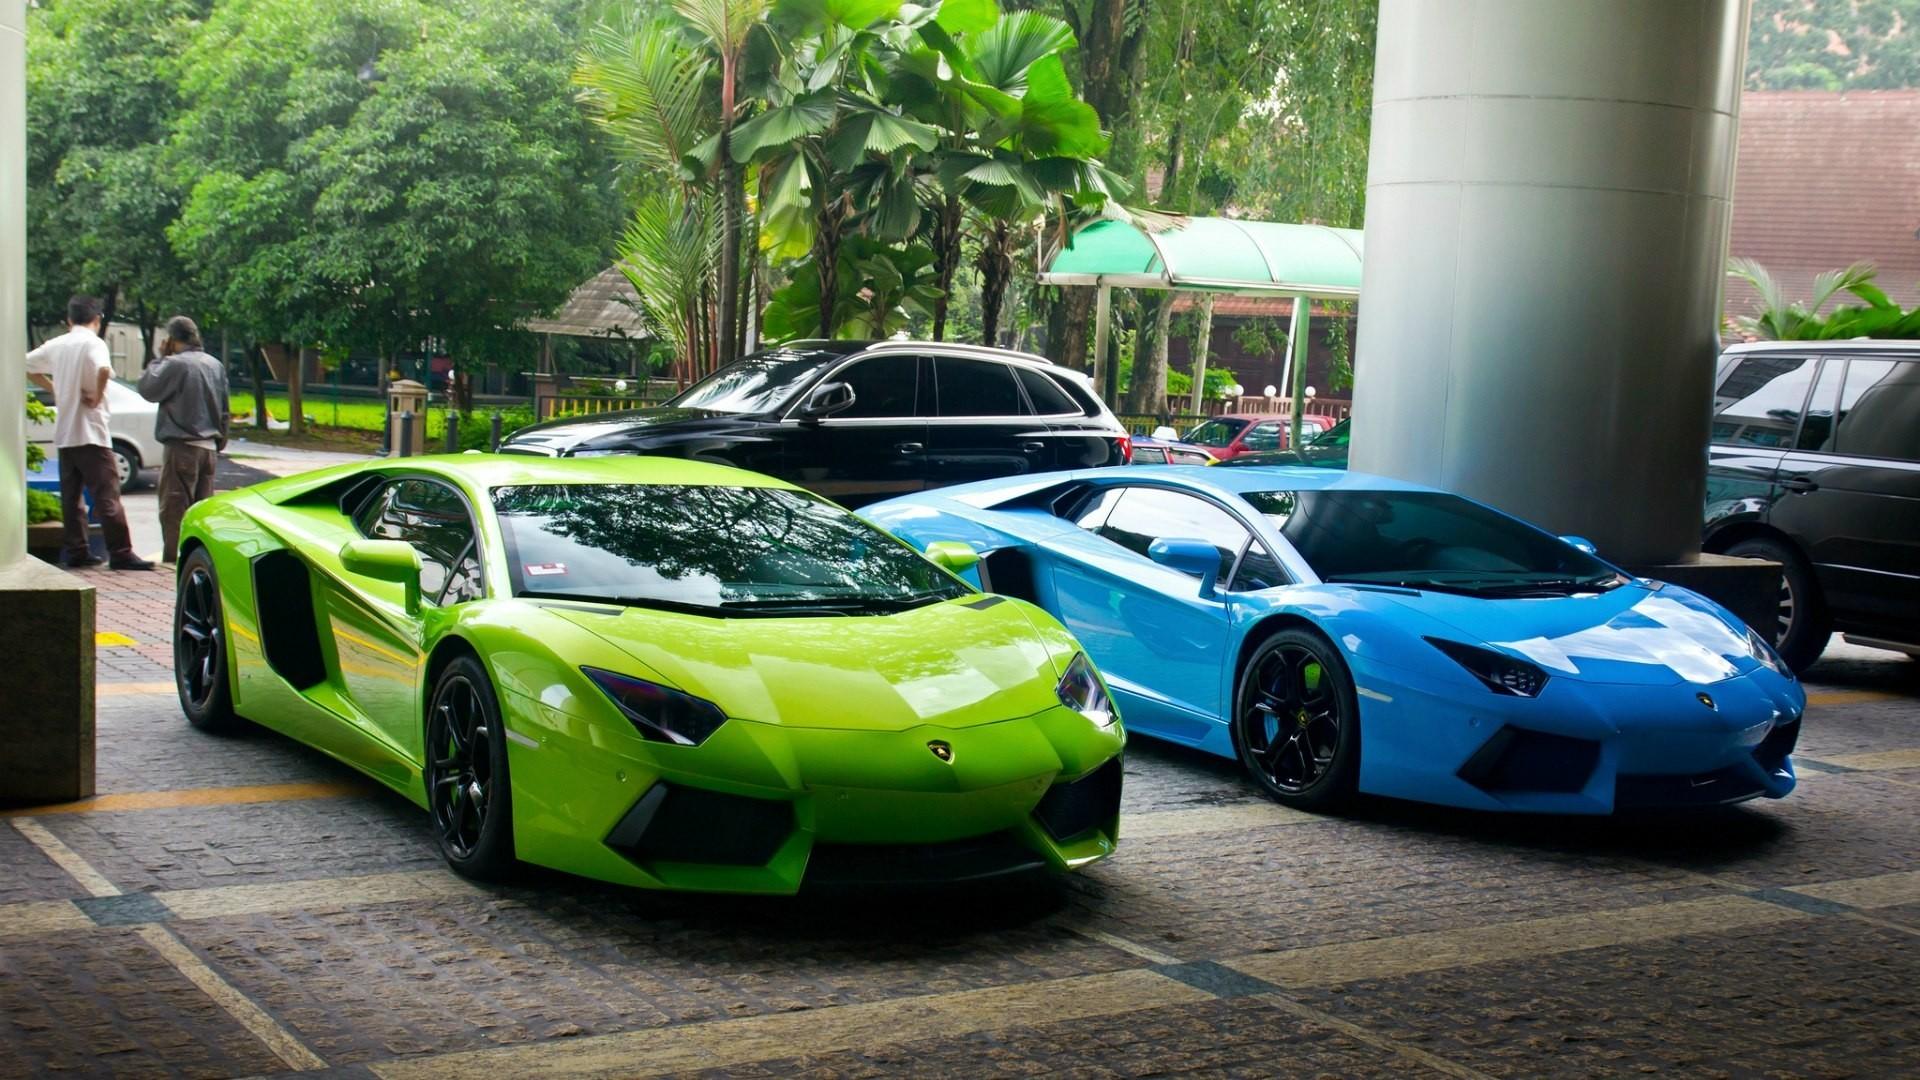 supercars car blue cars green cars vehicle